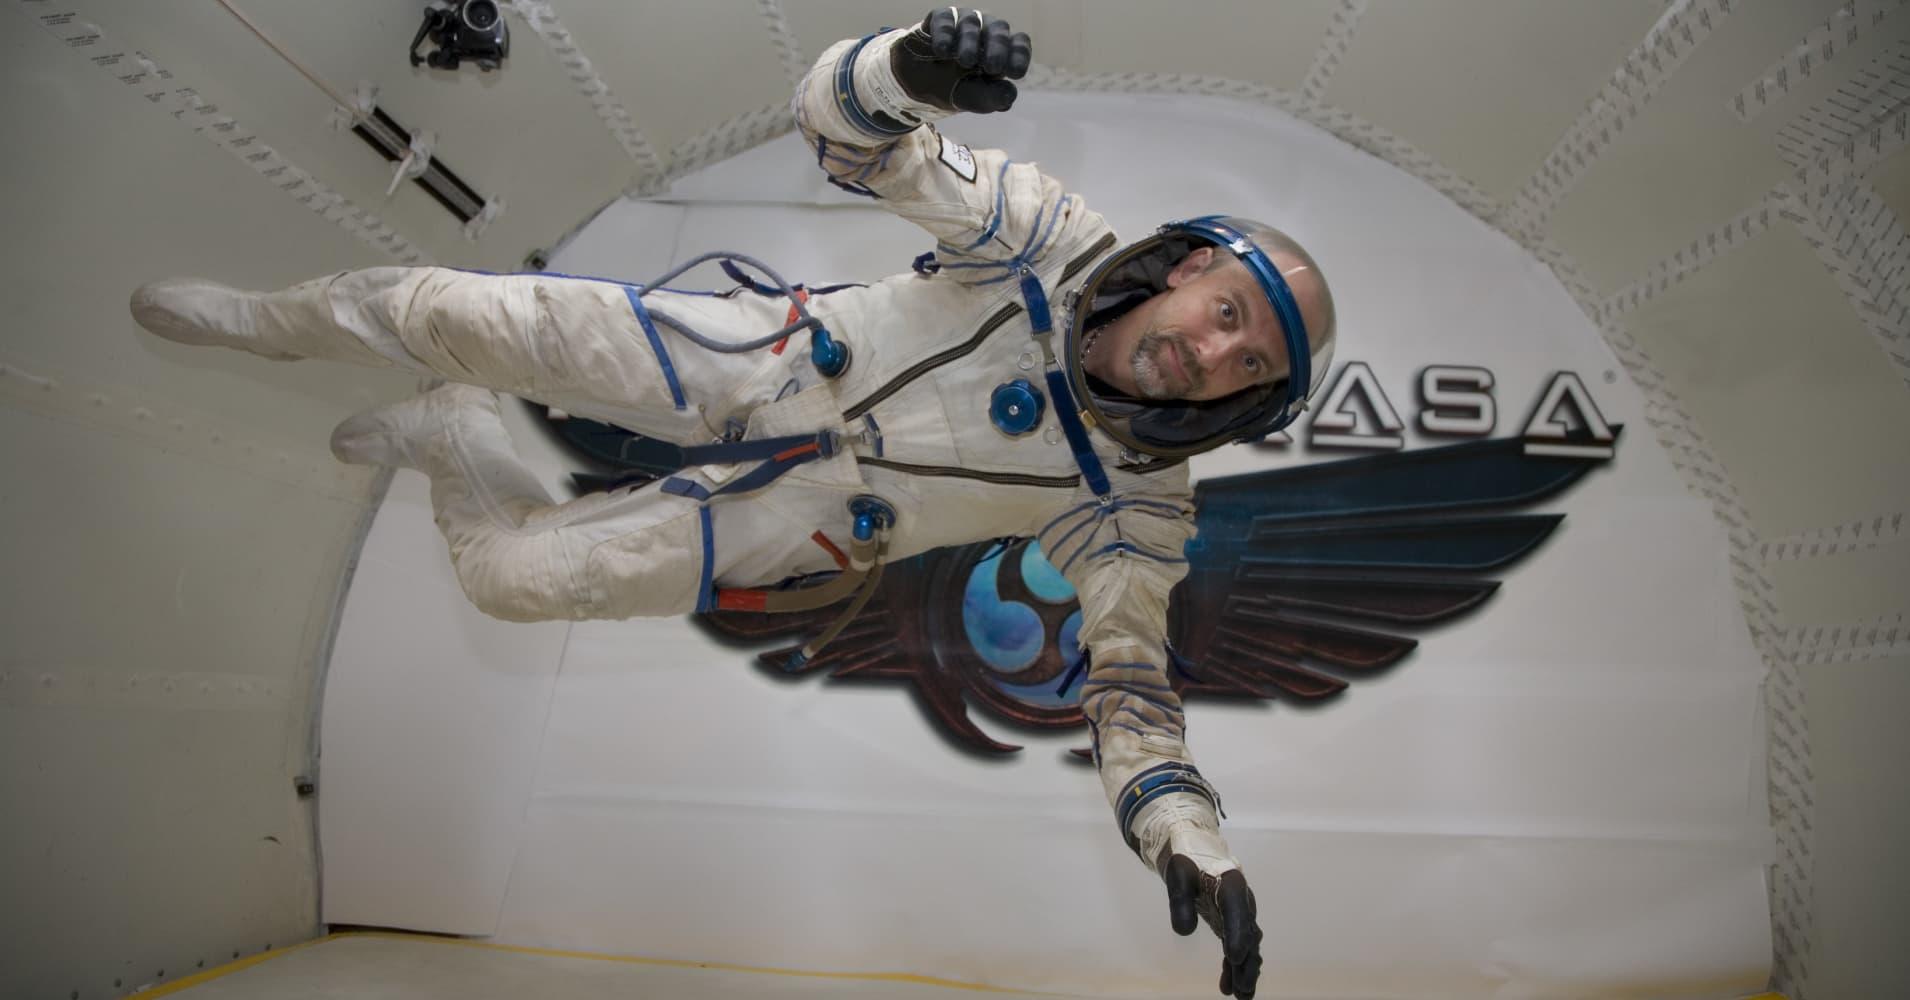 Richard Garriott floating in zero gravity.